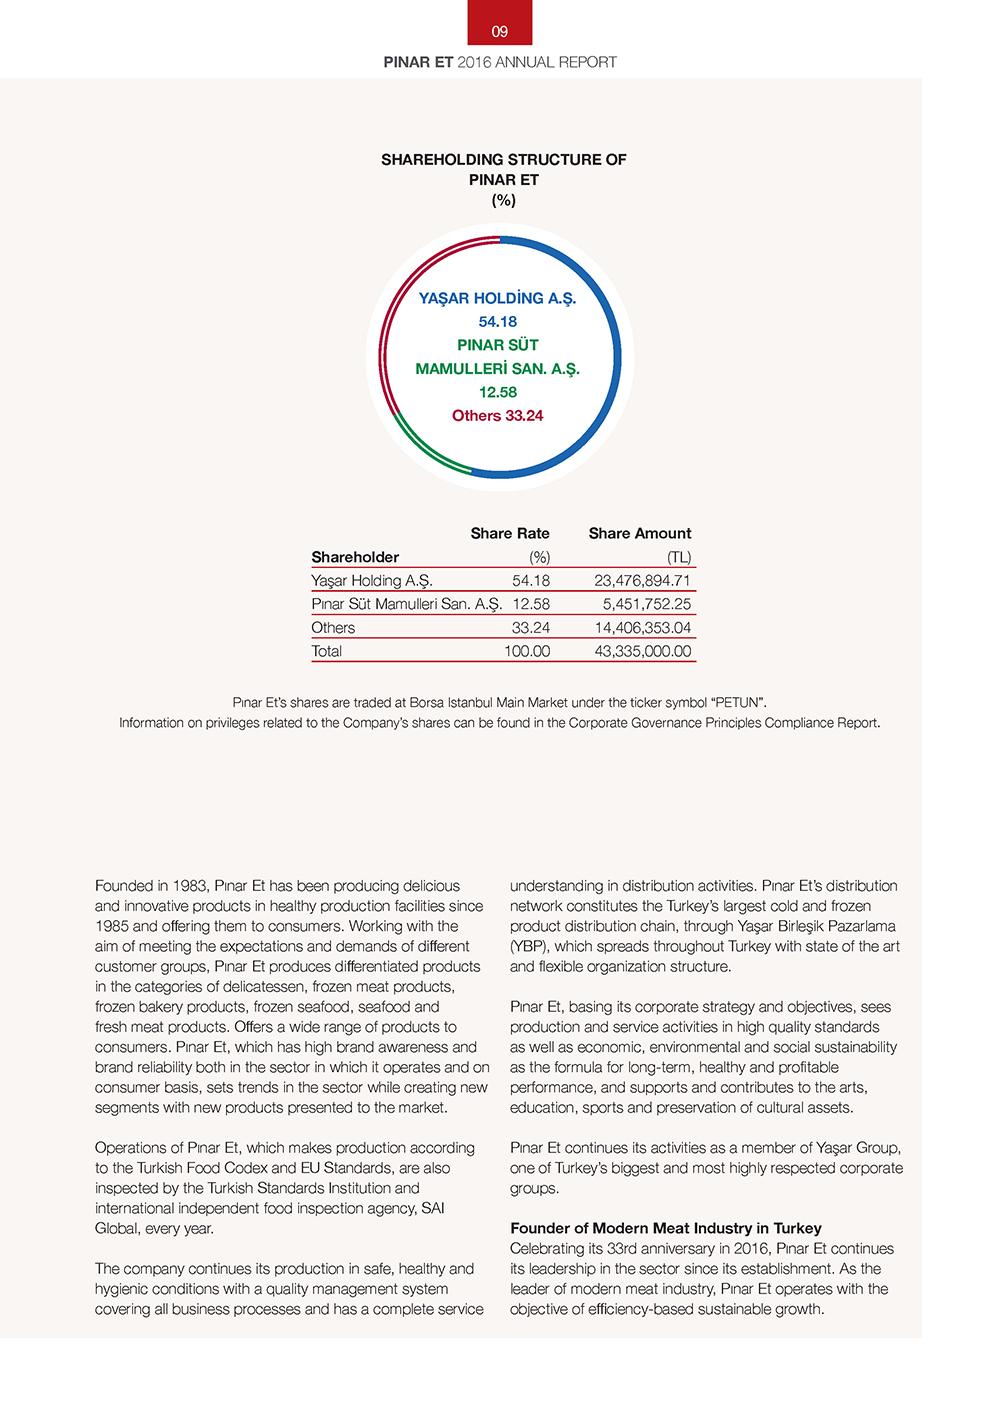 Company Profile – Pınar Et Faaliyet Raporu 2016